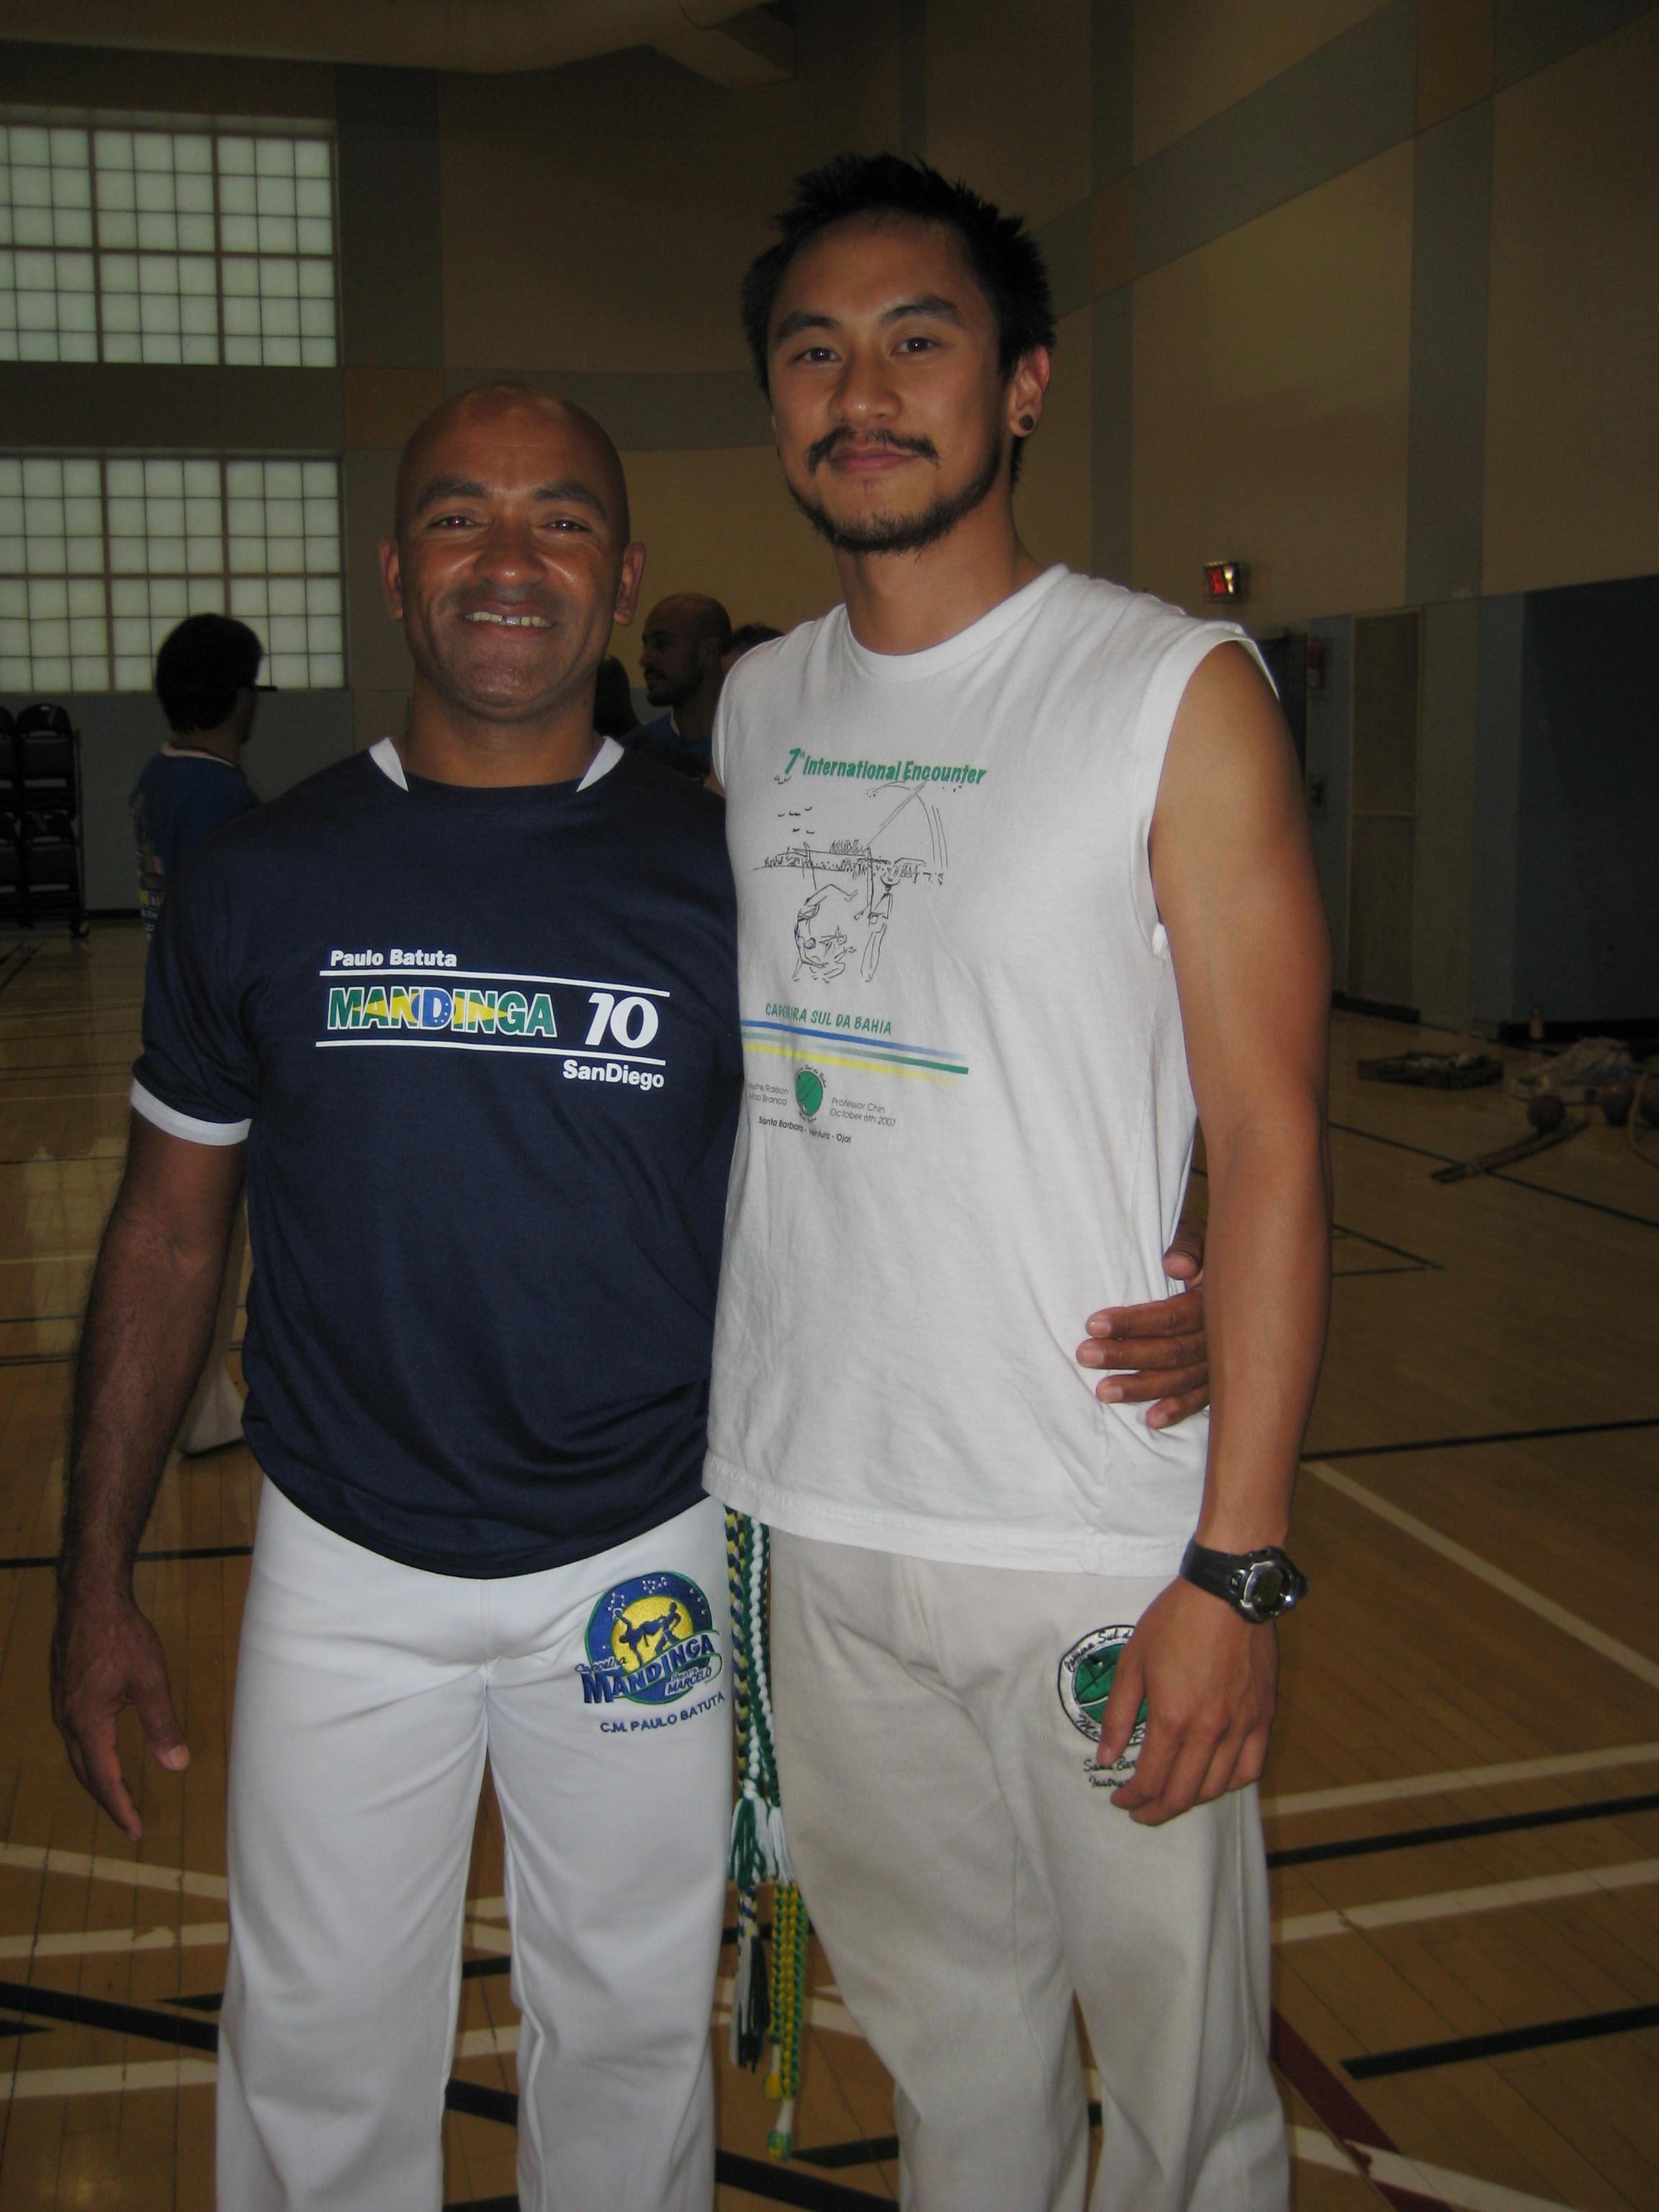 Mestre Paulo Batuta-San Diego